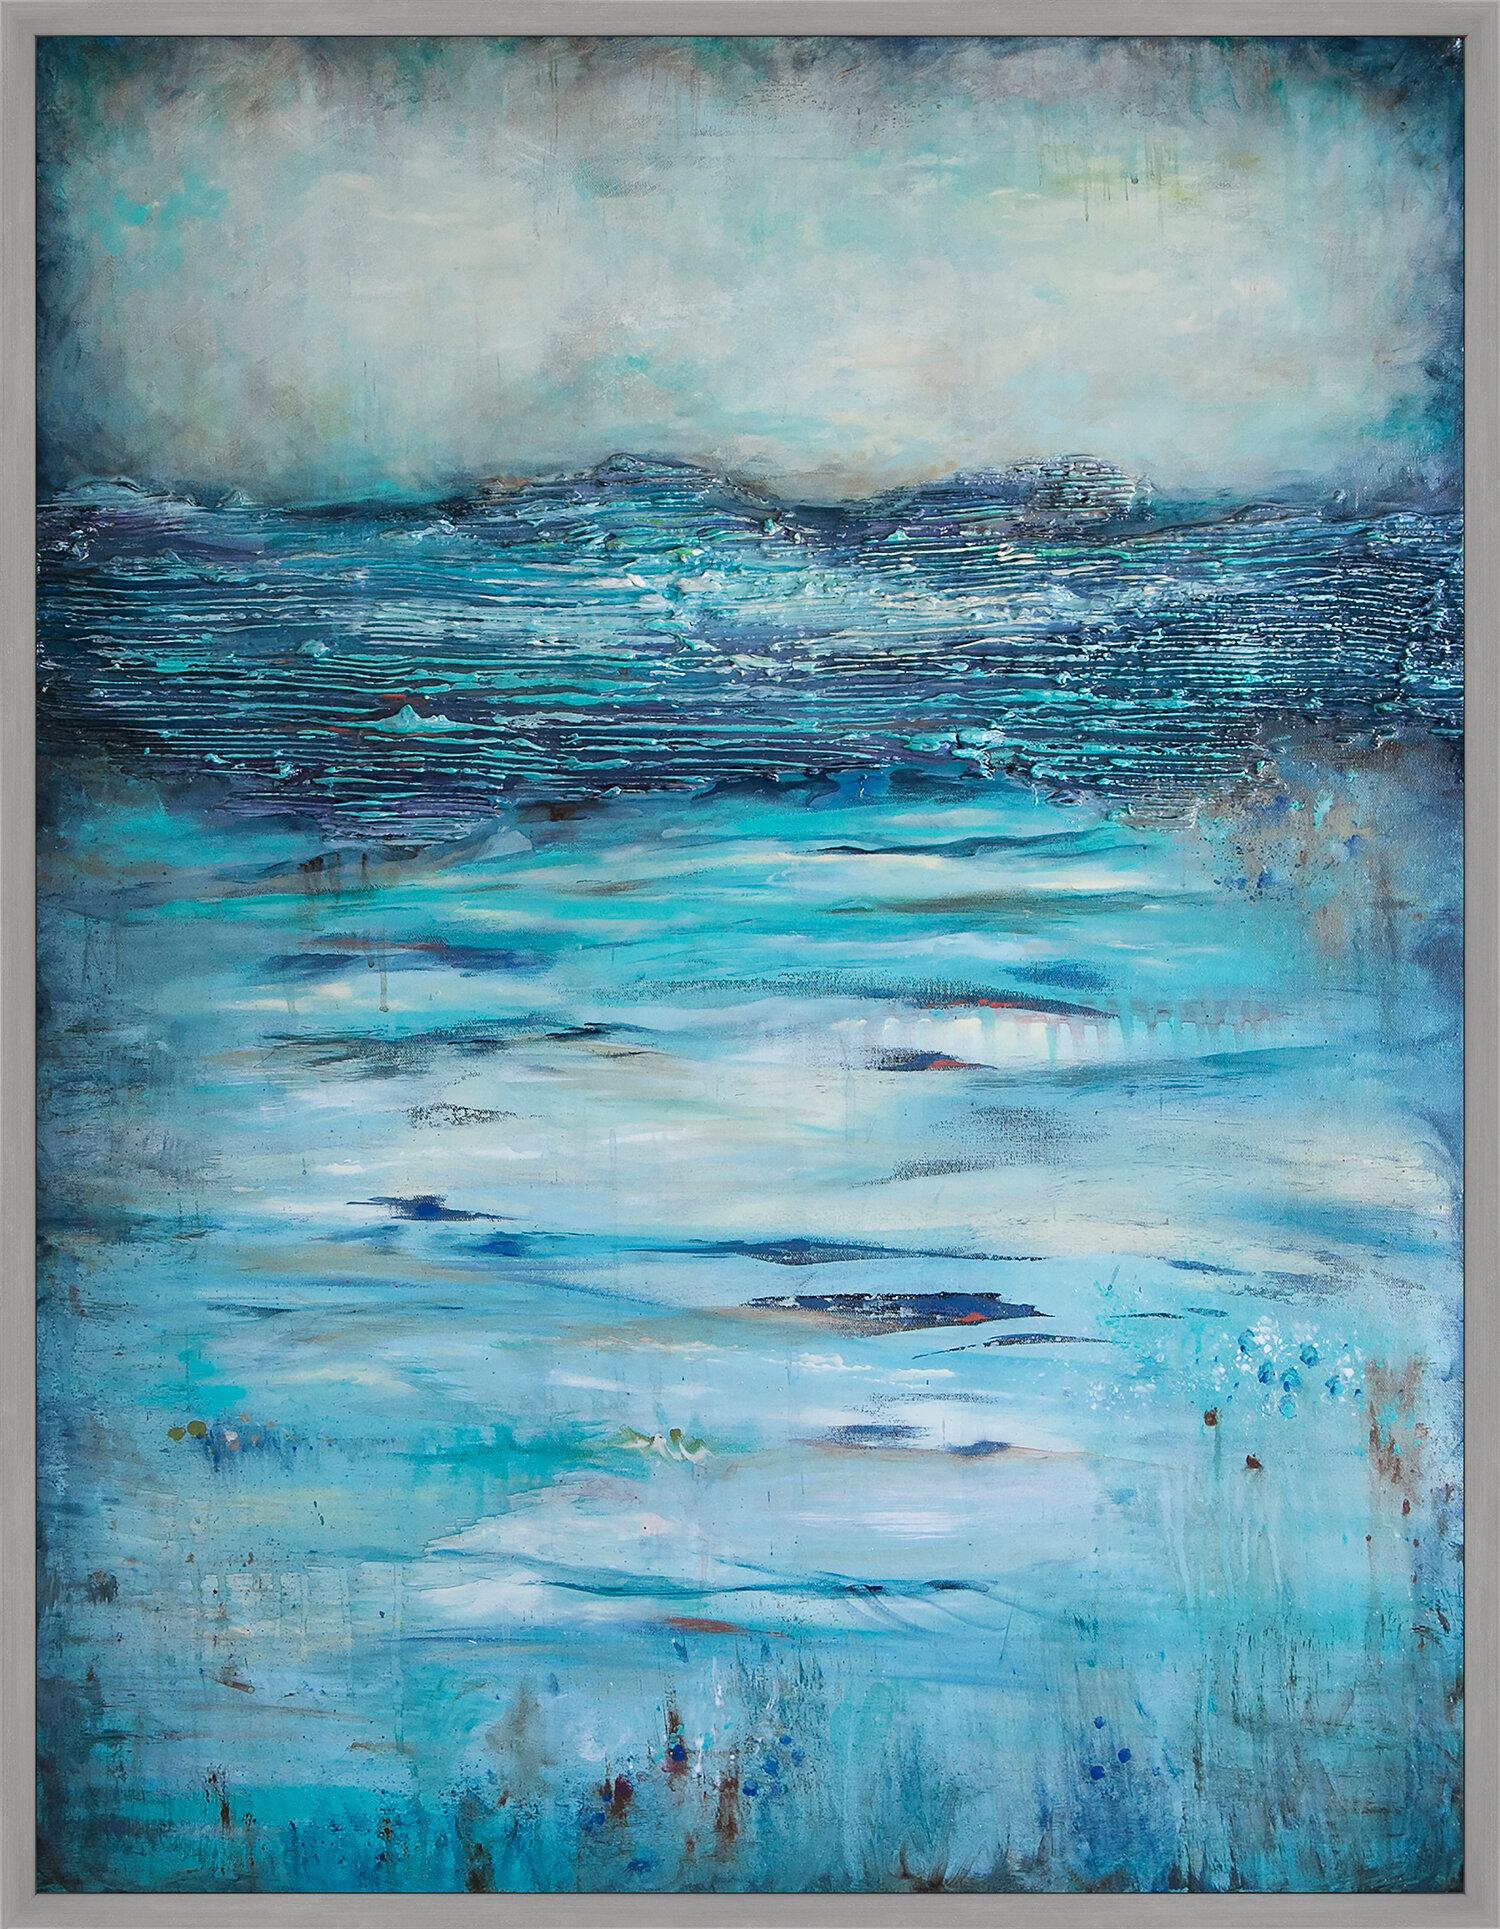 Ptm Images Mild Ocean Breeze By Michelle Hinz Framed Painting Print Wayfair